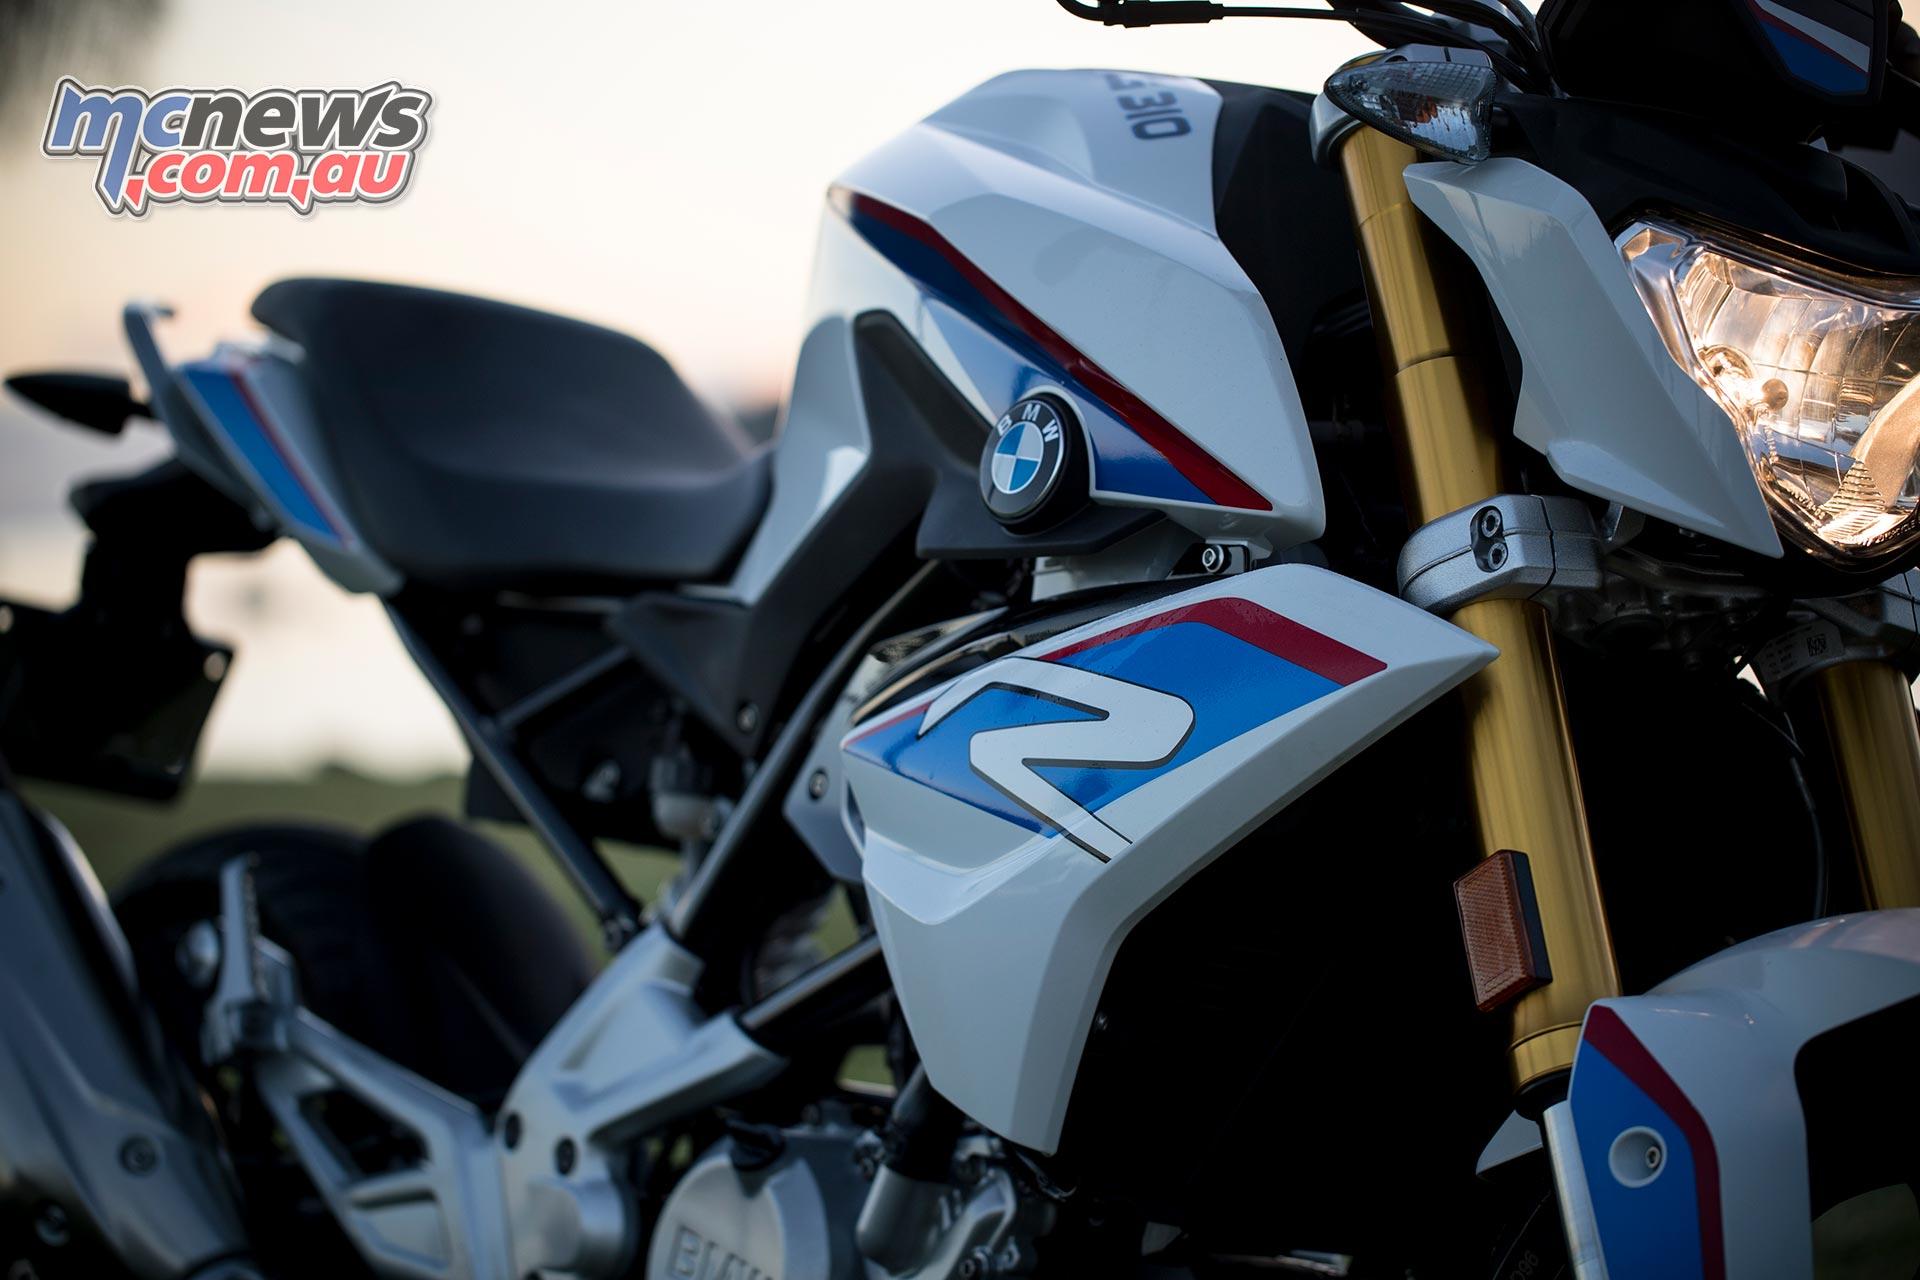 BMW G 310 R Review | BMW hits LAMS market | MCNews.com.au